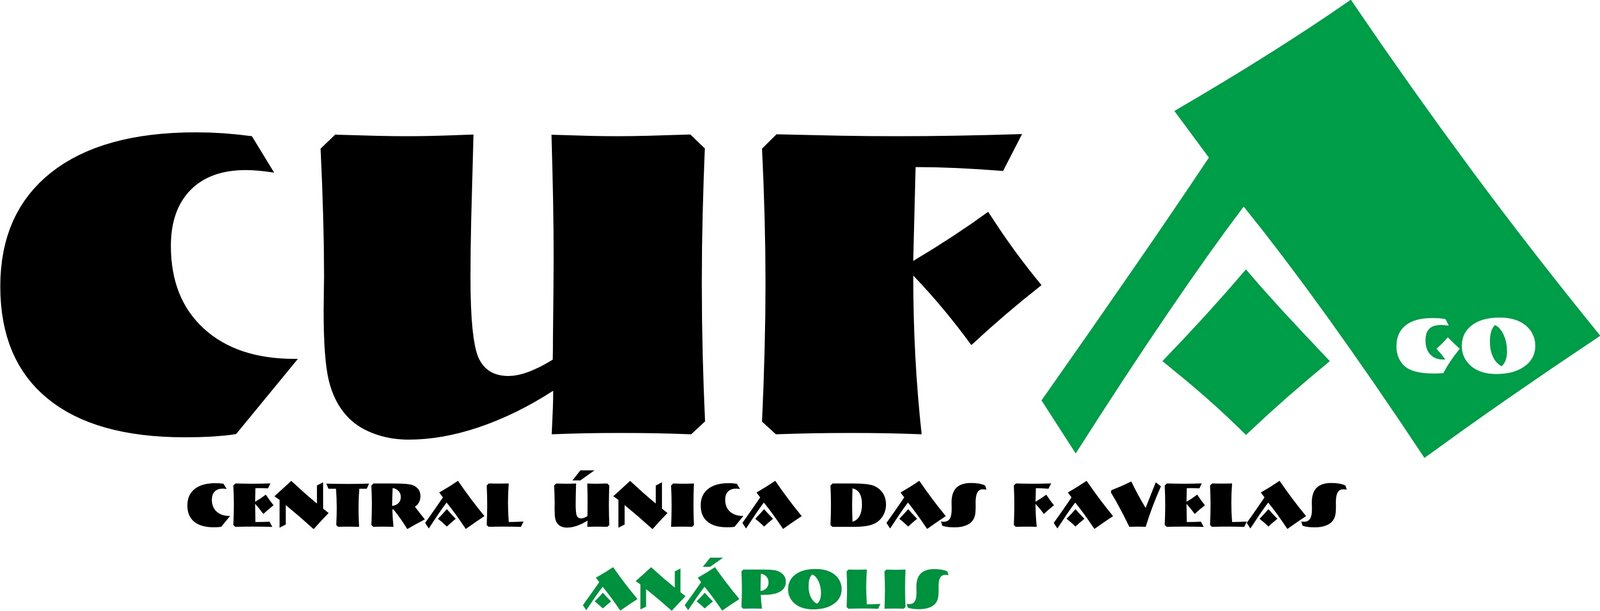 CUFA Anápolis